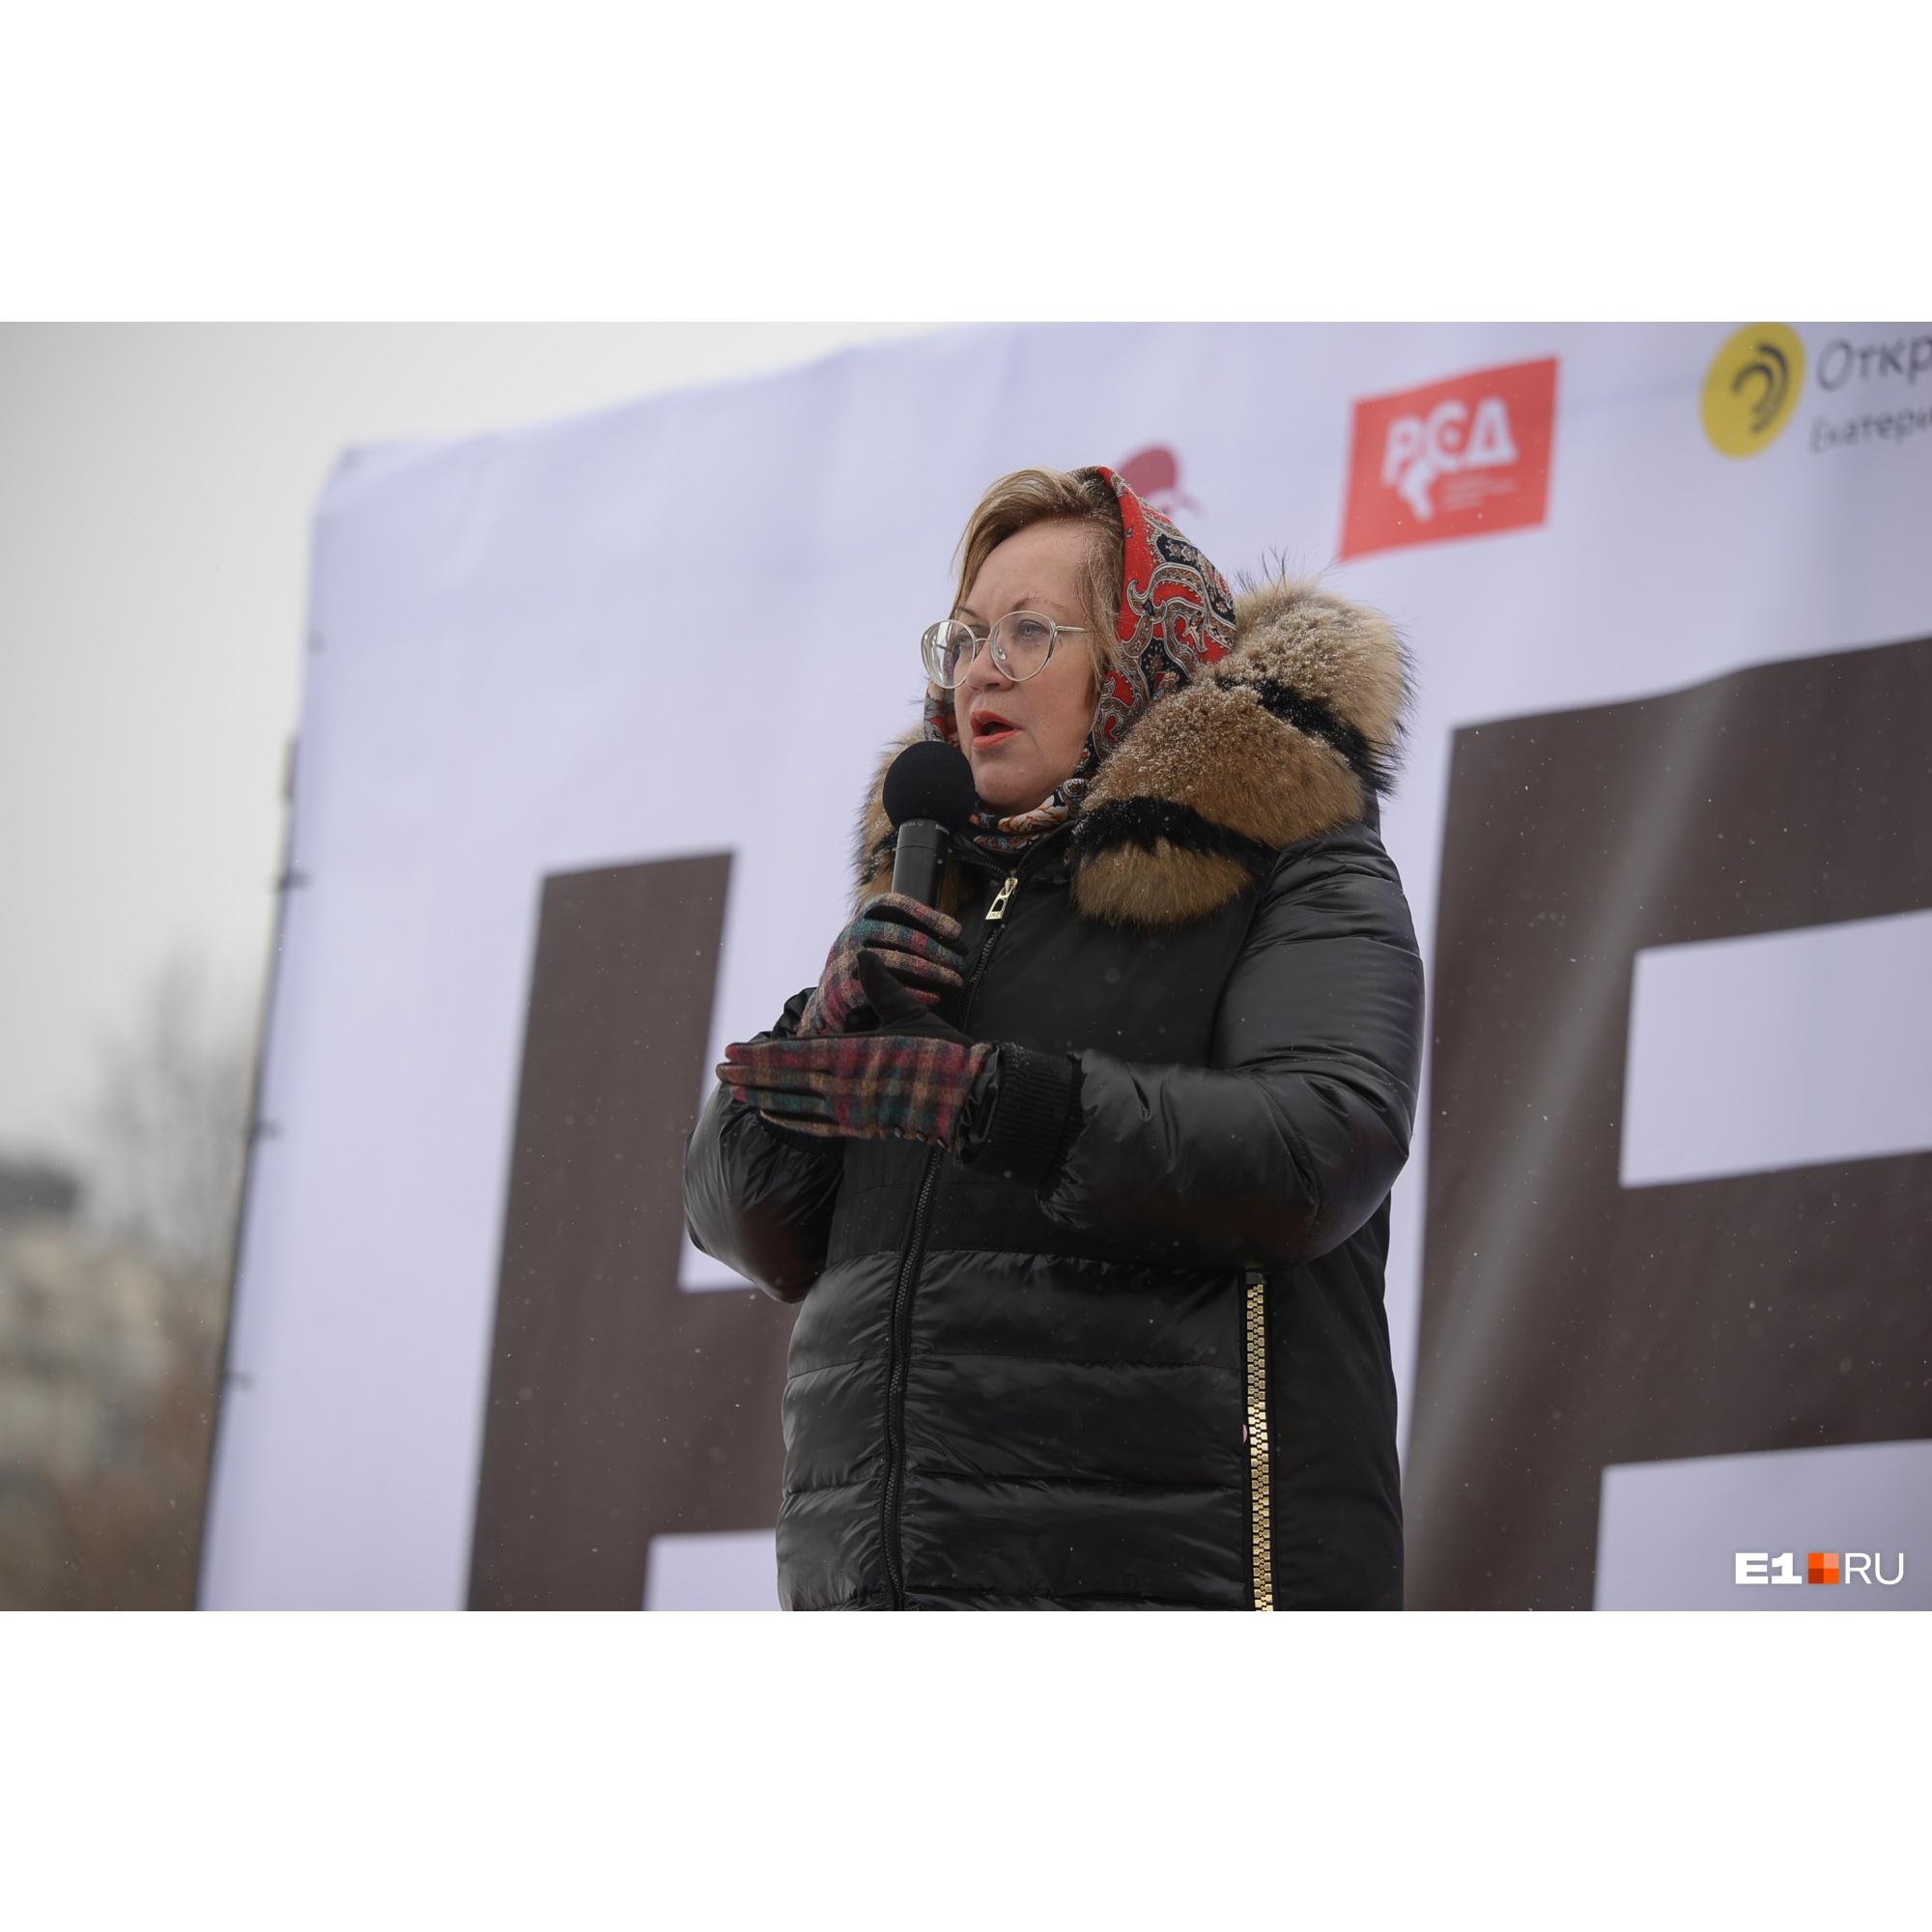 Омбудсмен Татьяна Мерзлякова выступила со сцены